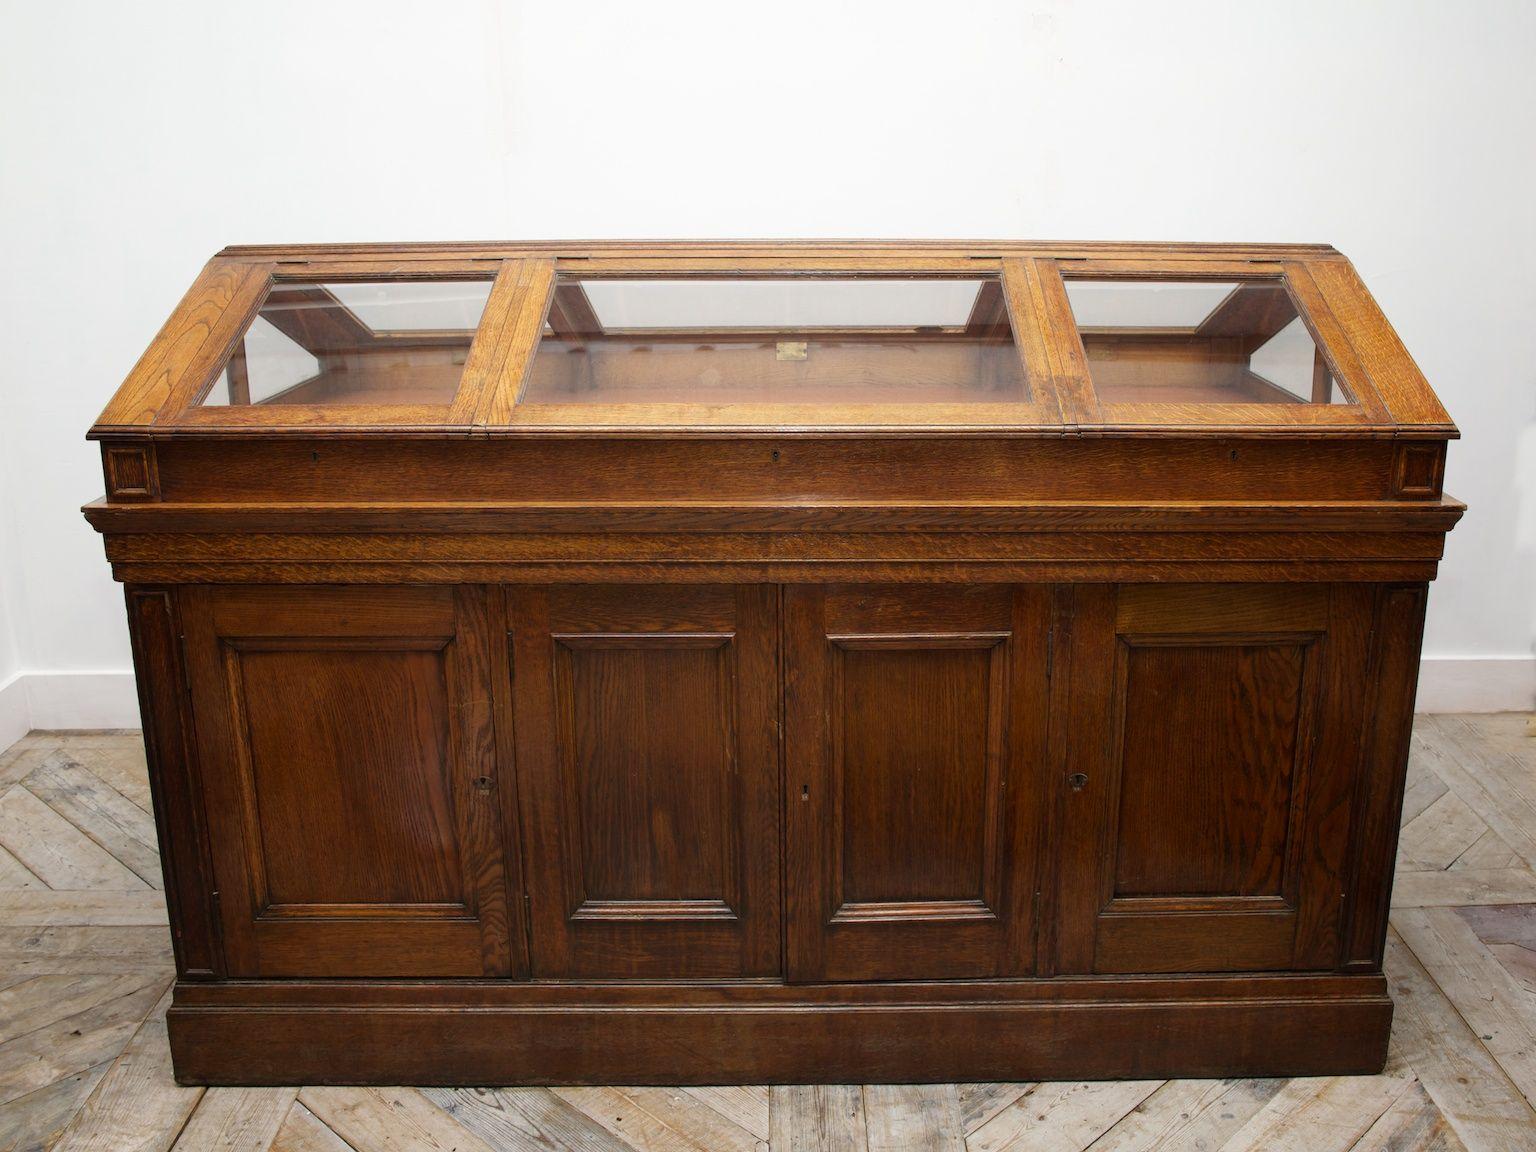 Oak Museum Display Case 1890s 2 For The Home Pinterest  # Bonnetiere En Pin Brute